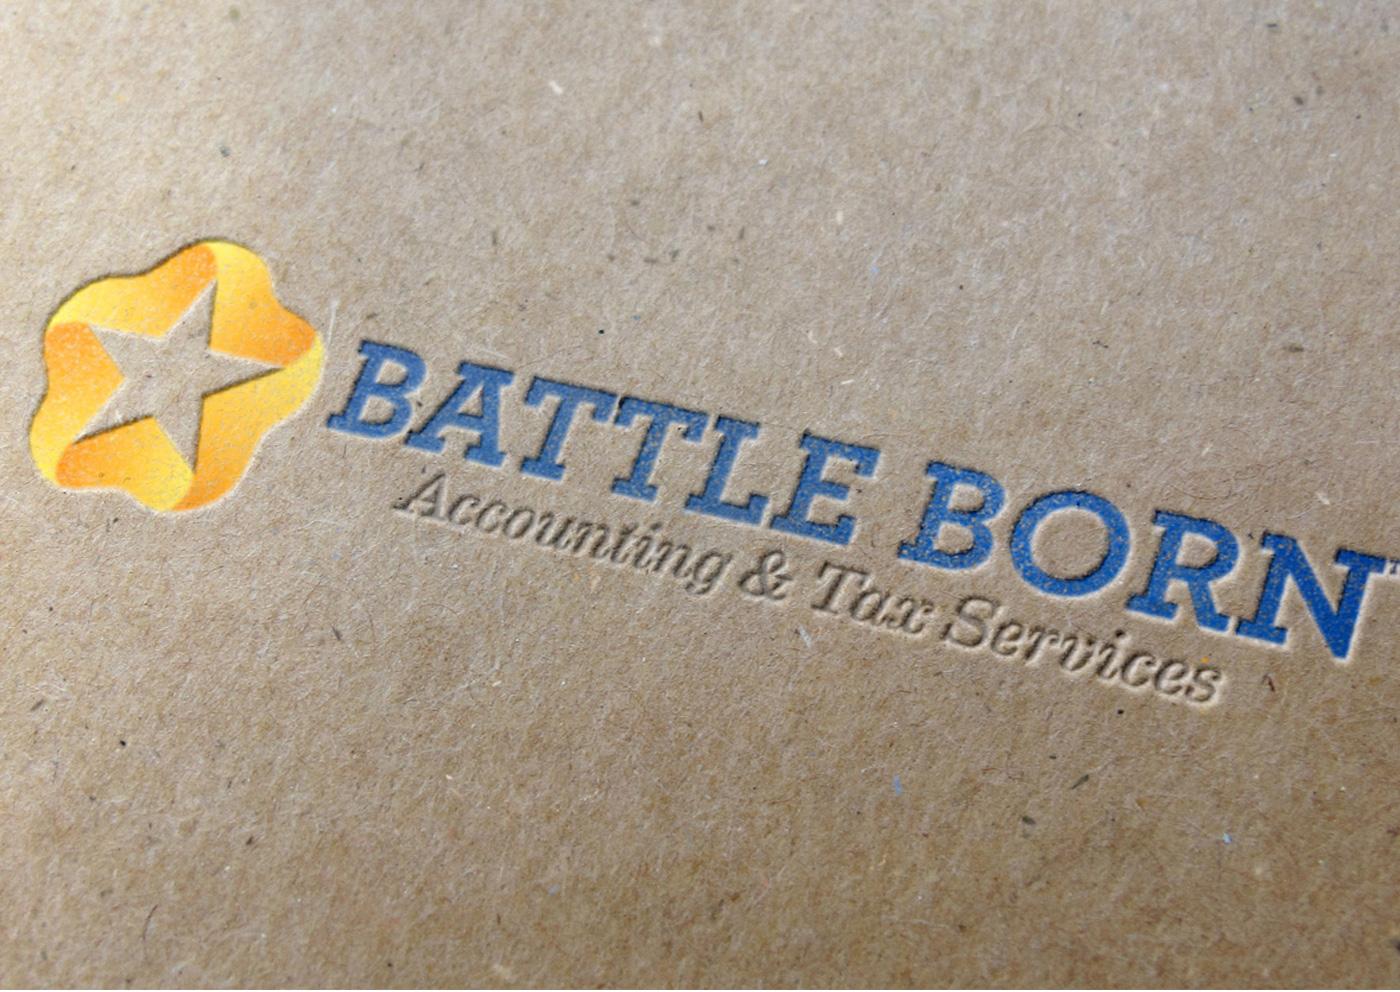 BattleBornCPS-ForWeb_01